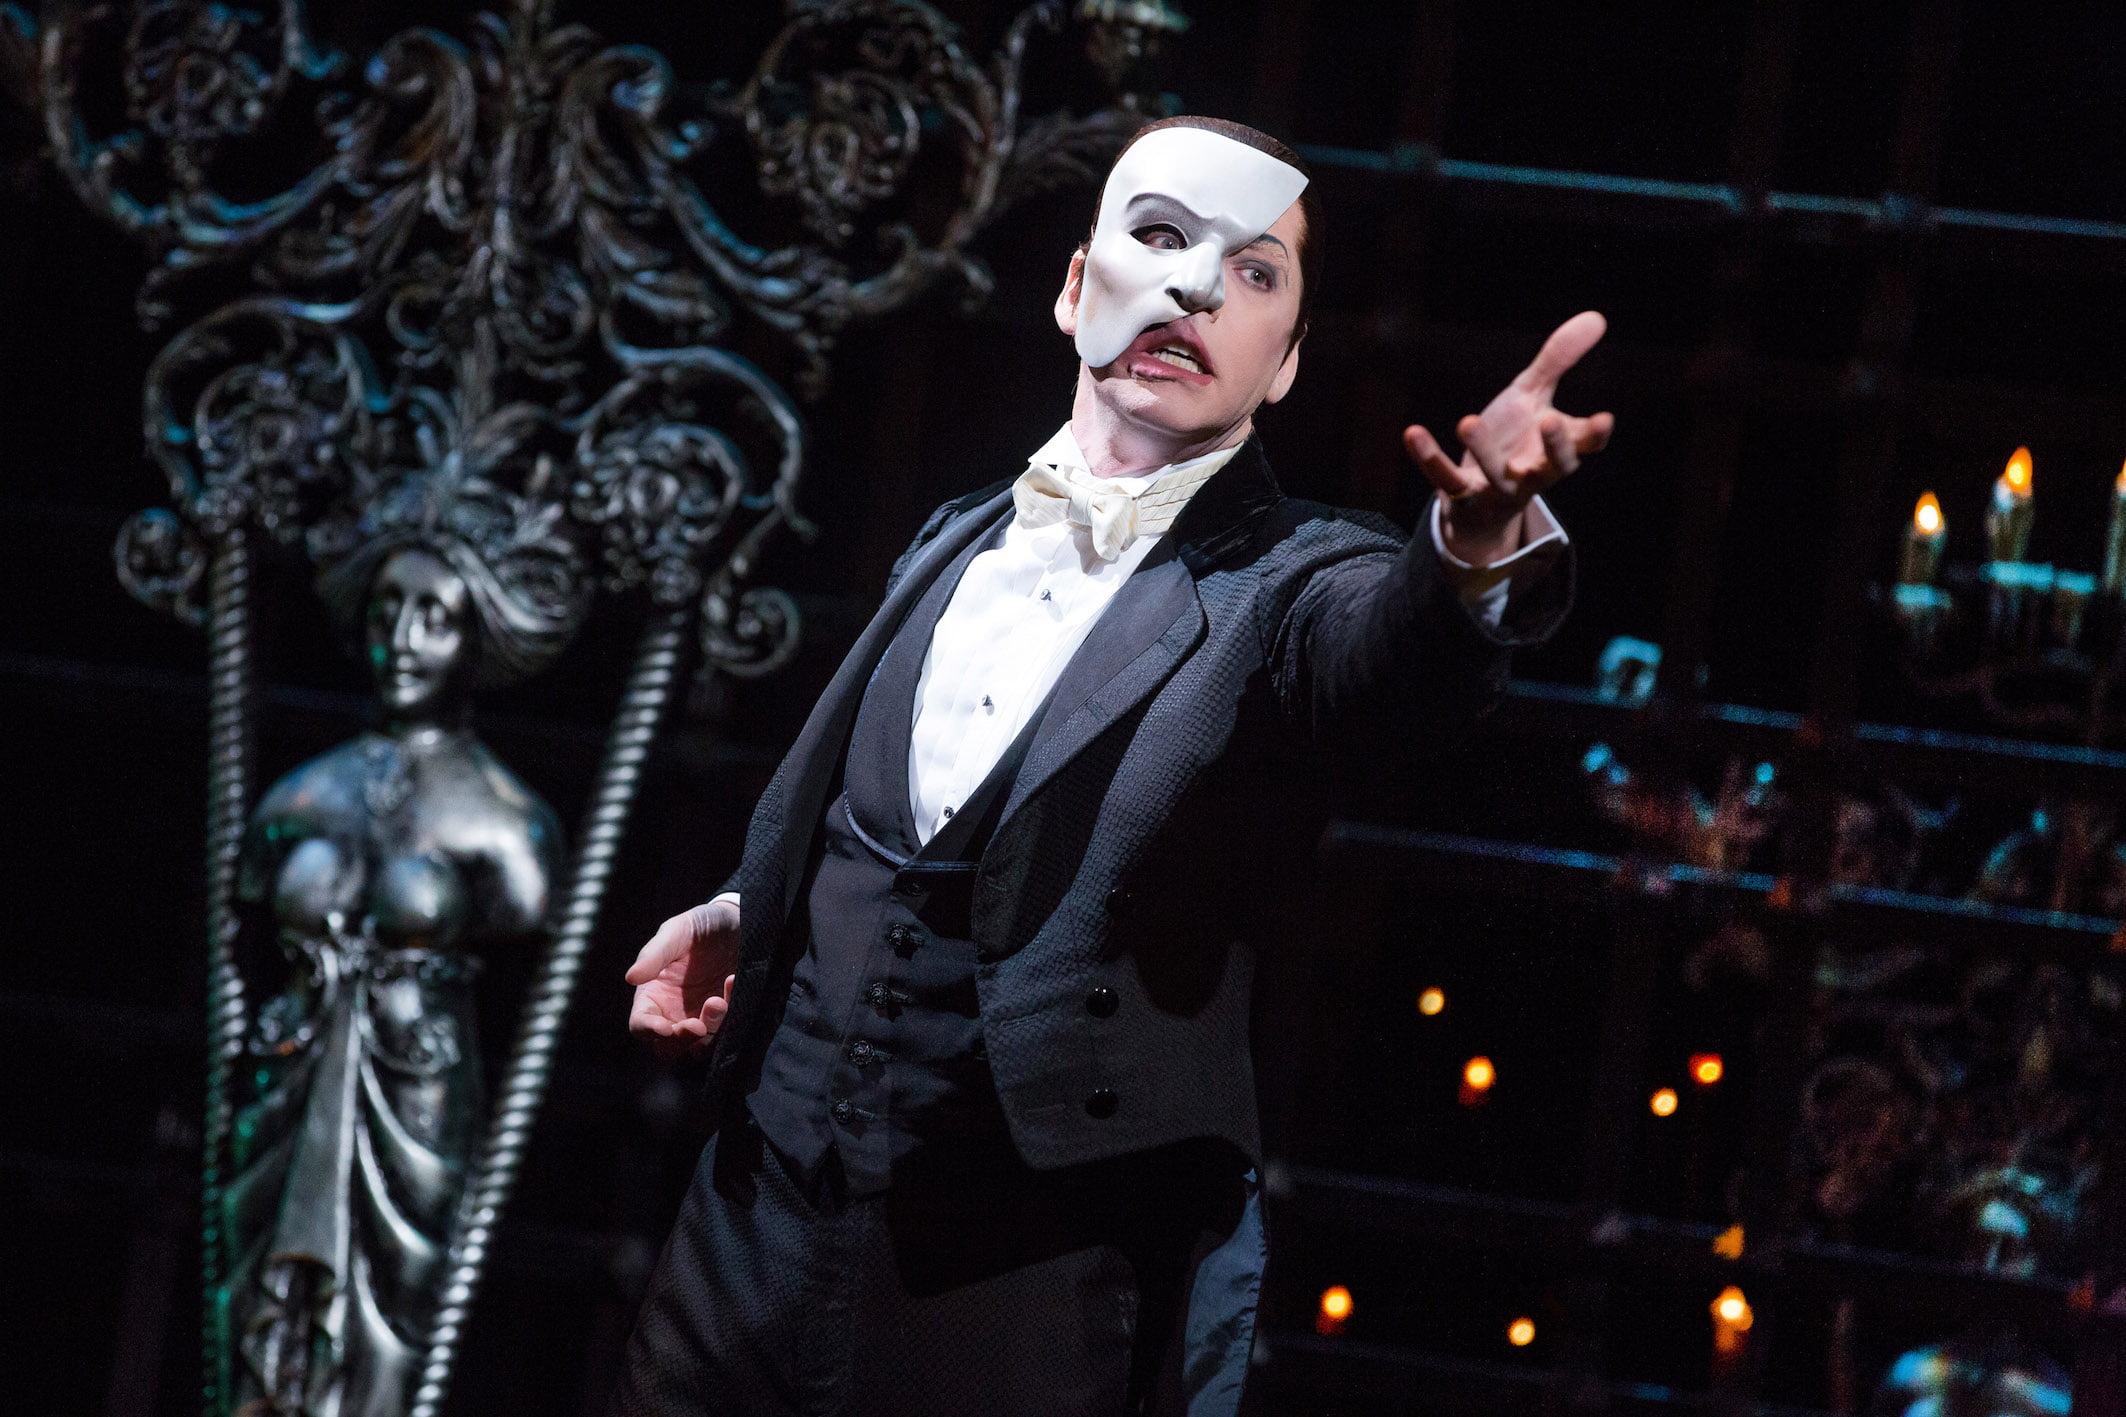 Os 30 anos de O Fantasma da Ópera na Broadway